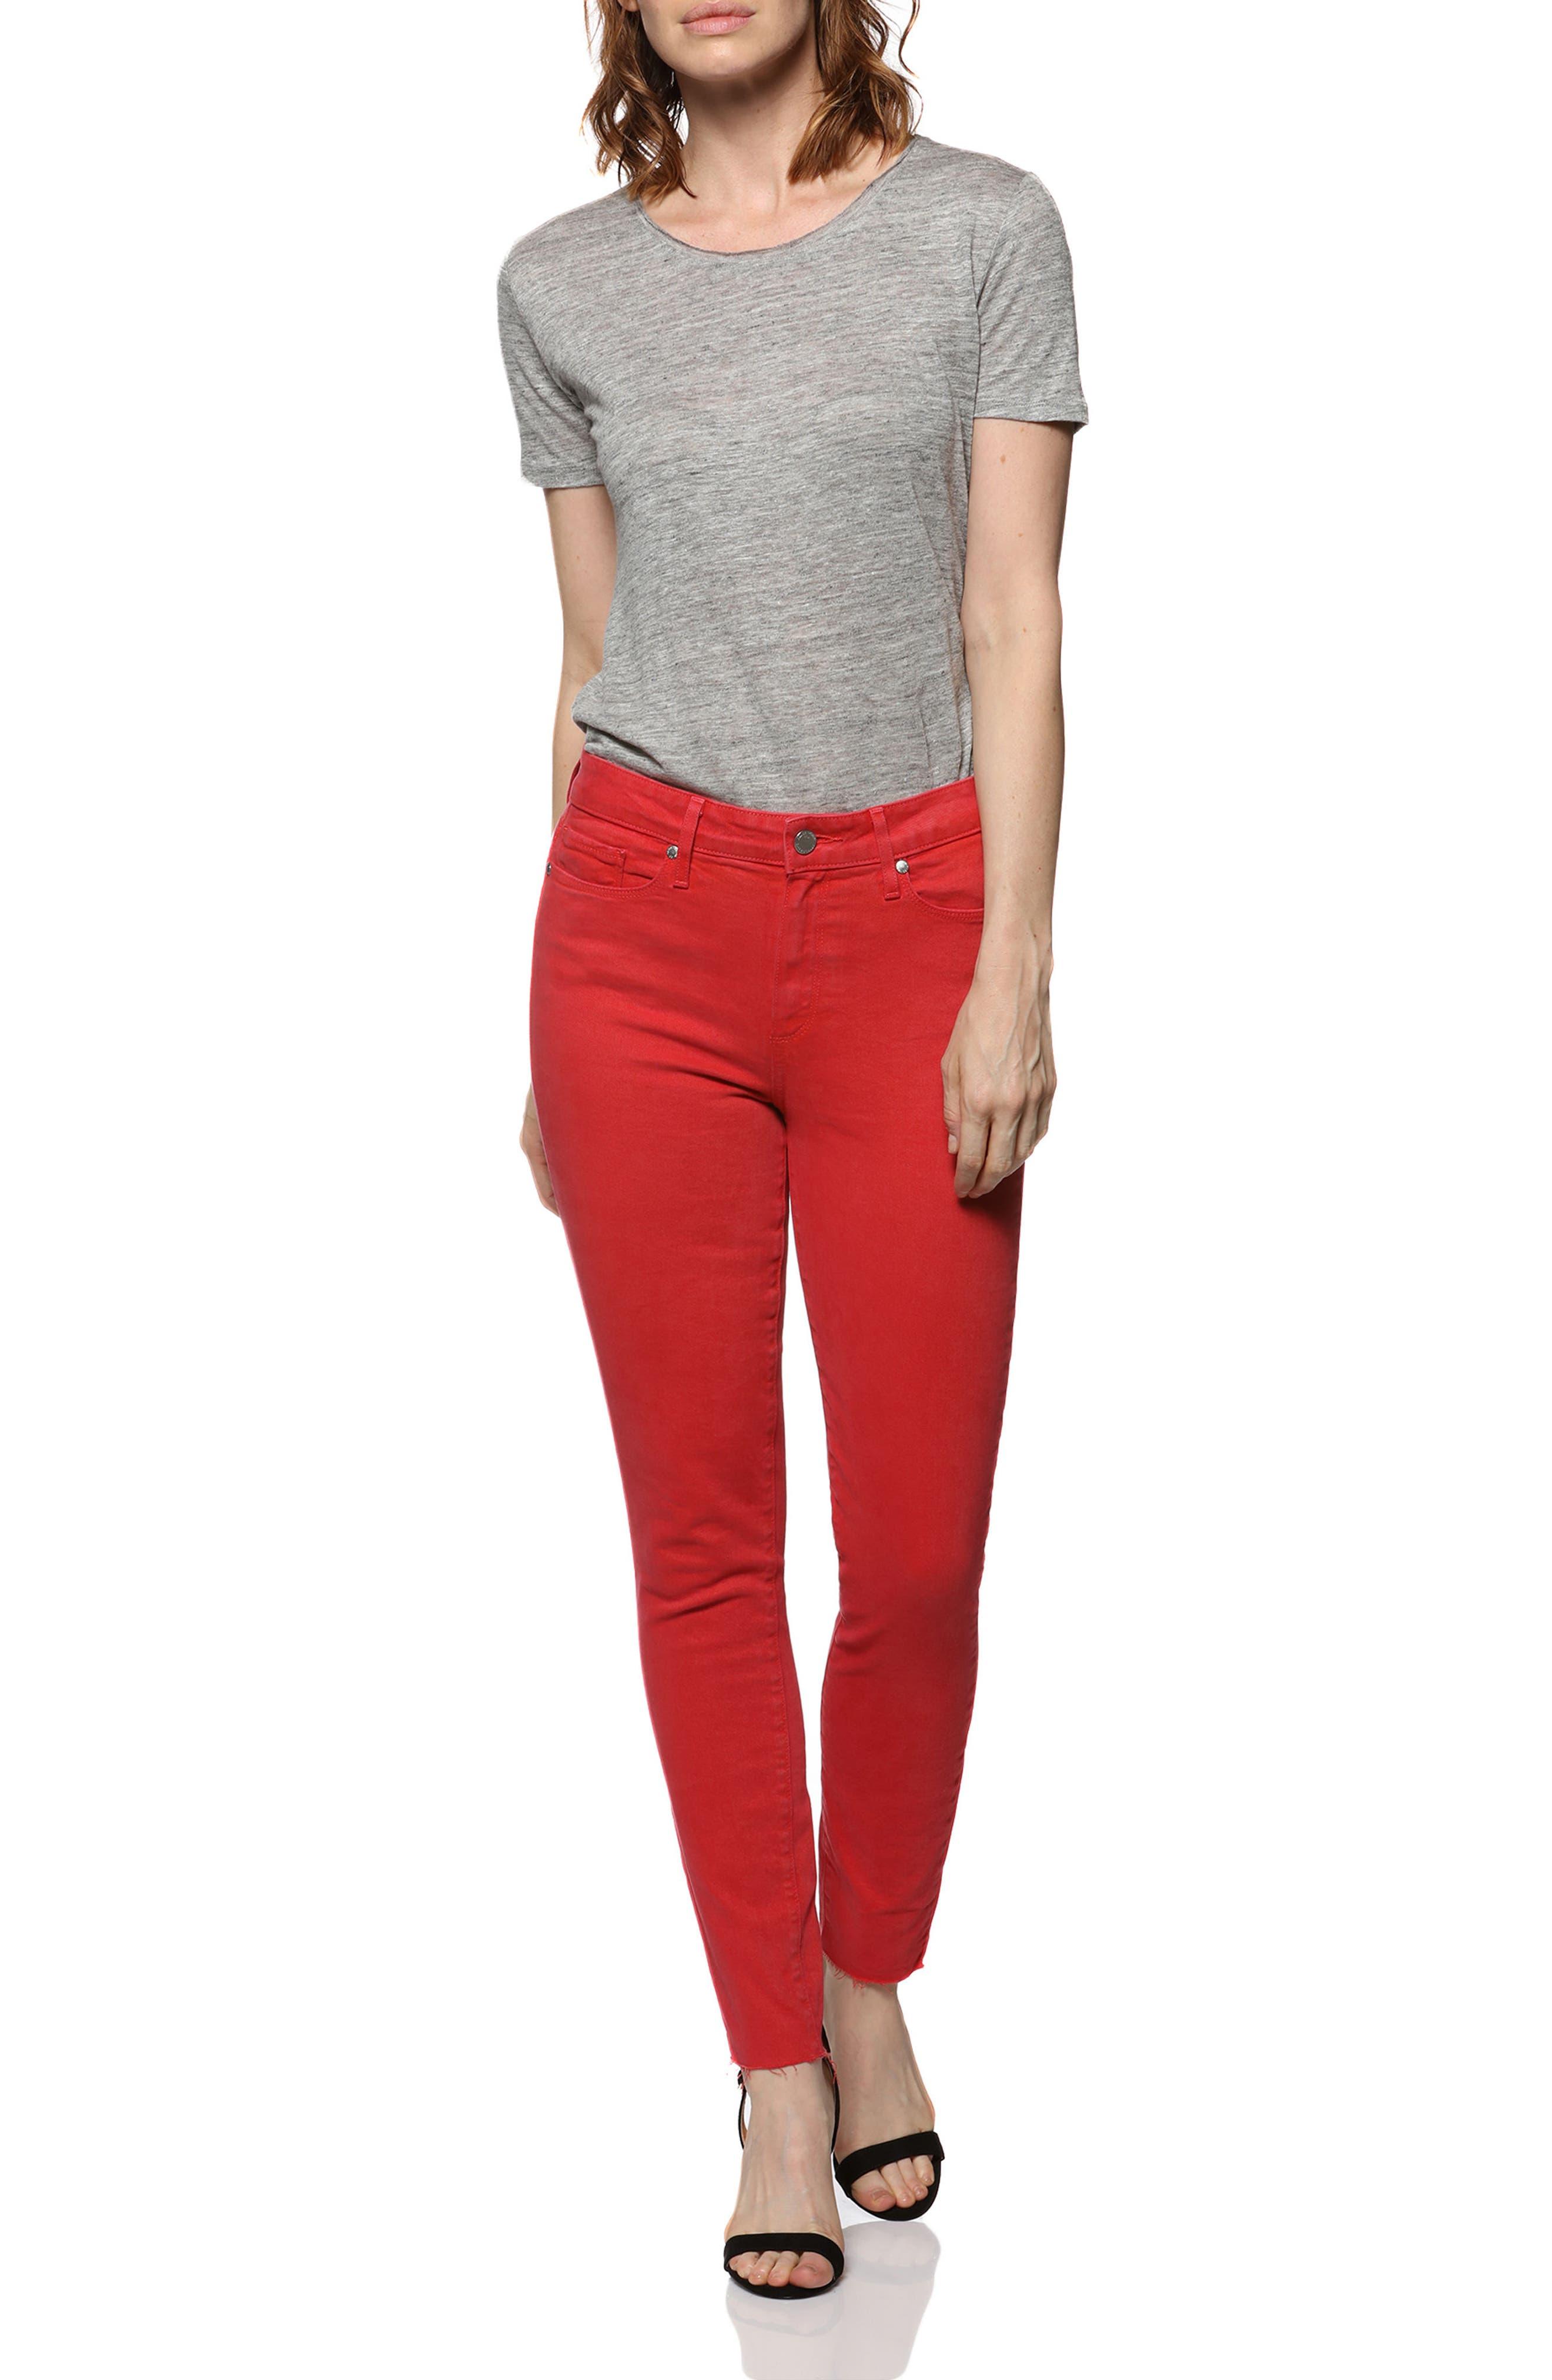 Hoxton High Waist Ankle Skinny Jeans,                             Alternate thumbnail 3, color,                             649